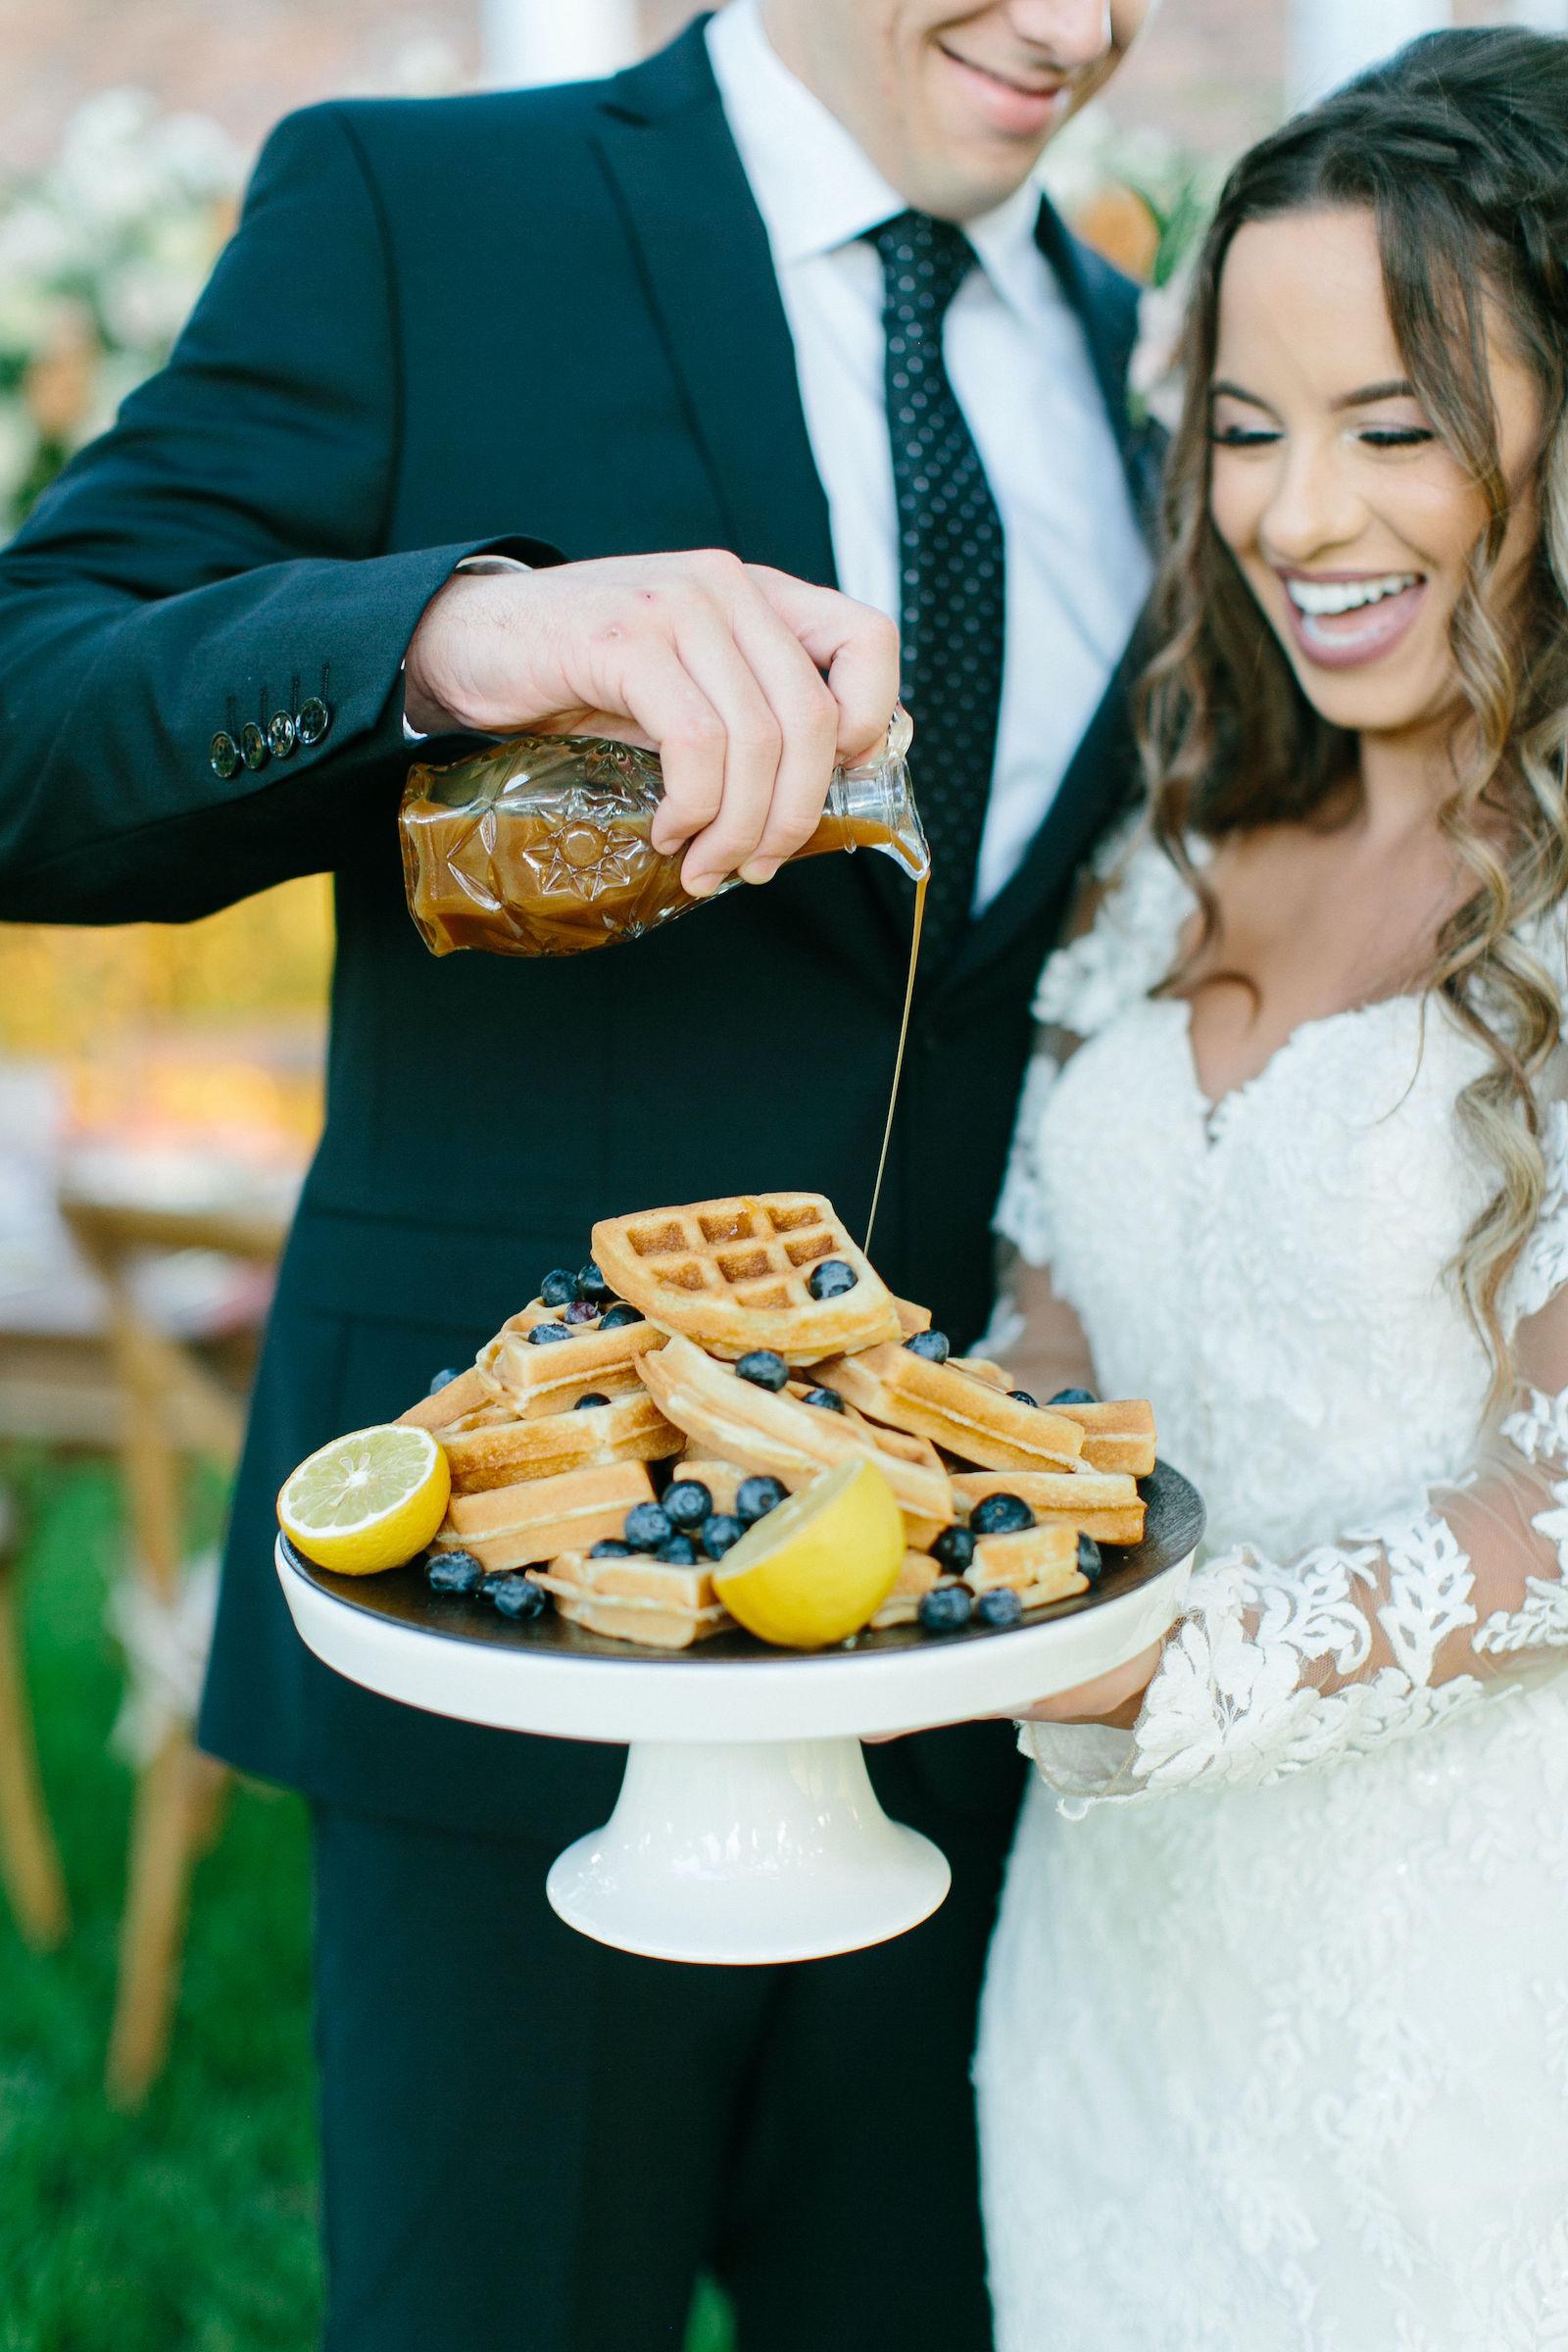 Styled Shoot Brunch Wedding Waffle Tower Breakfast